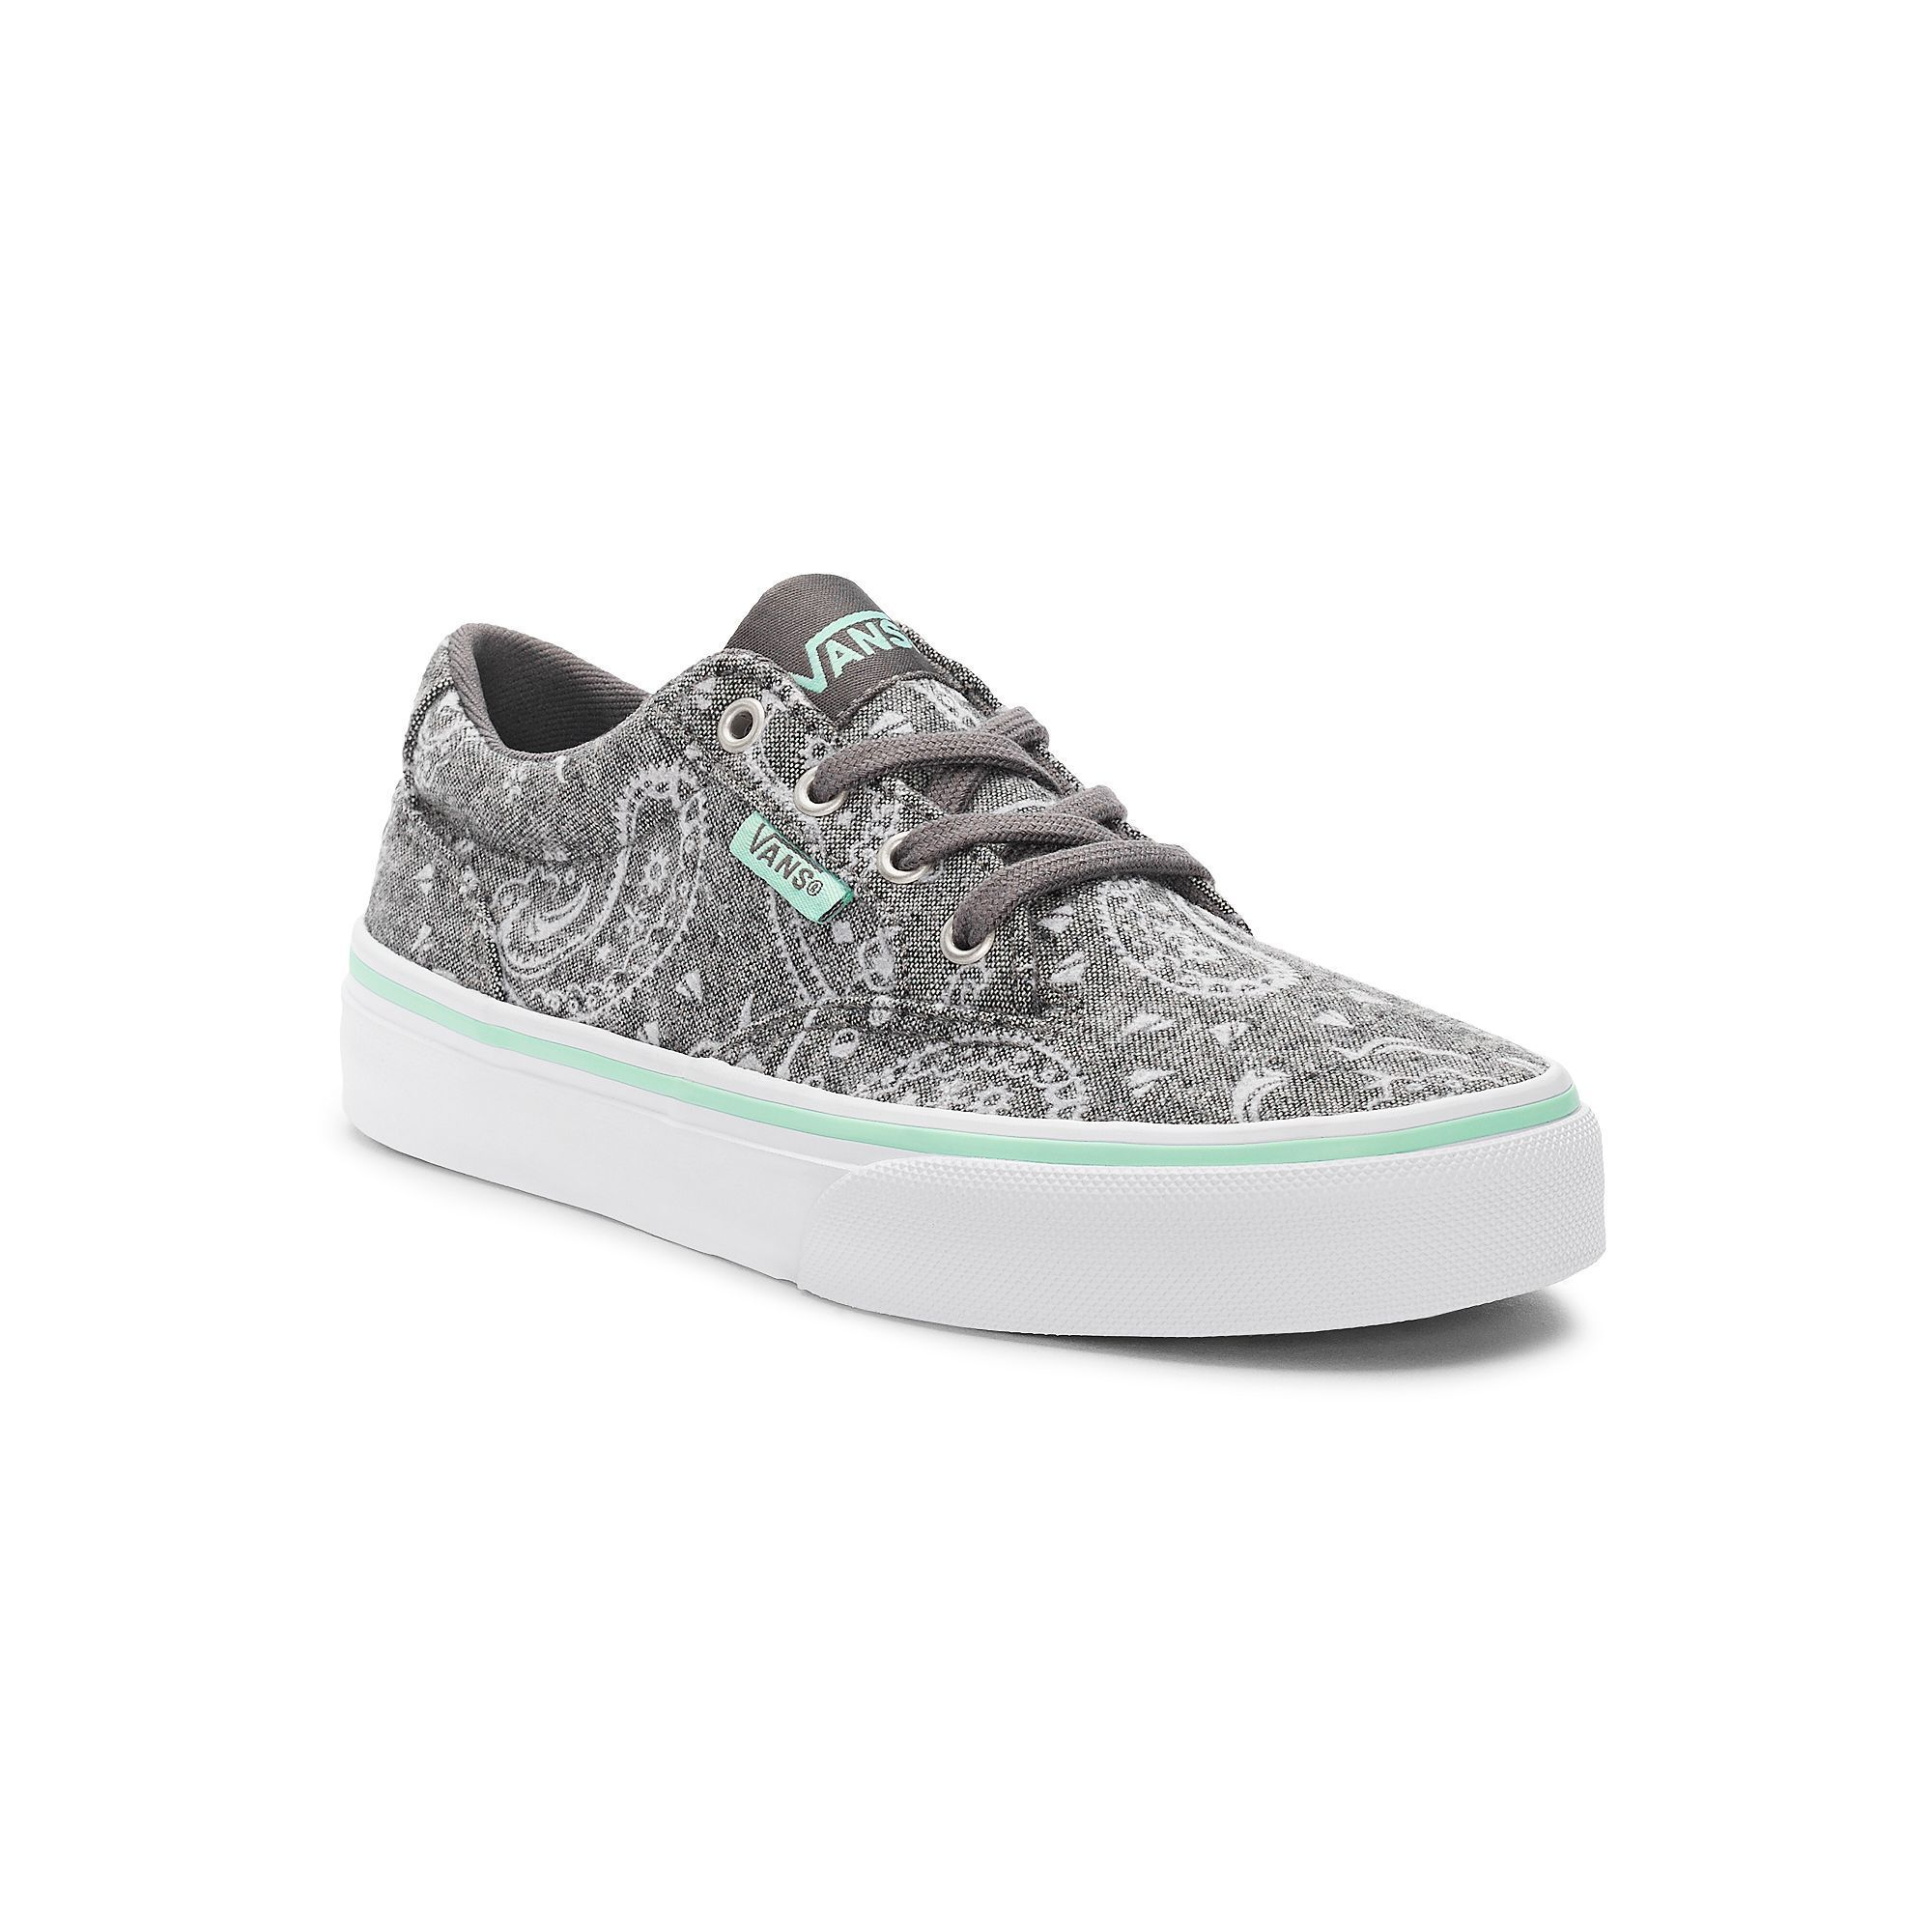 Vans Winston Girls' Skate Shoes, Size